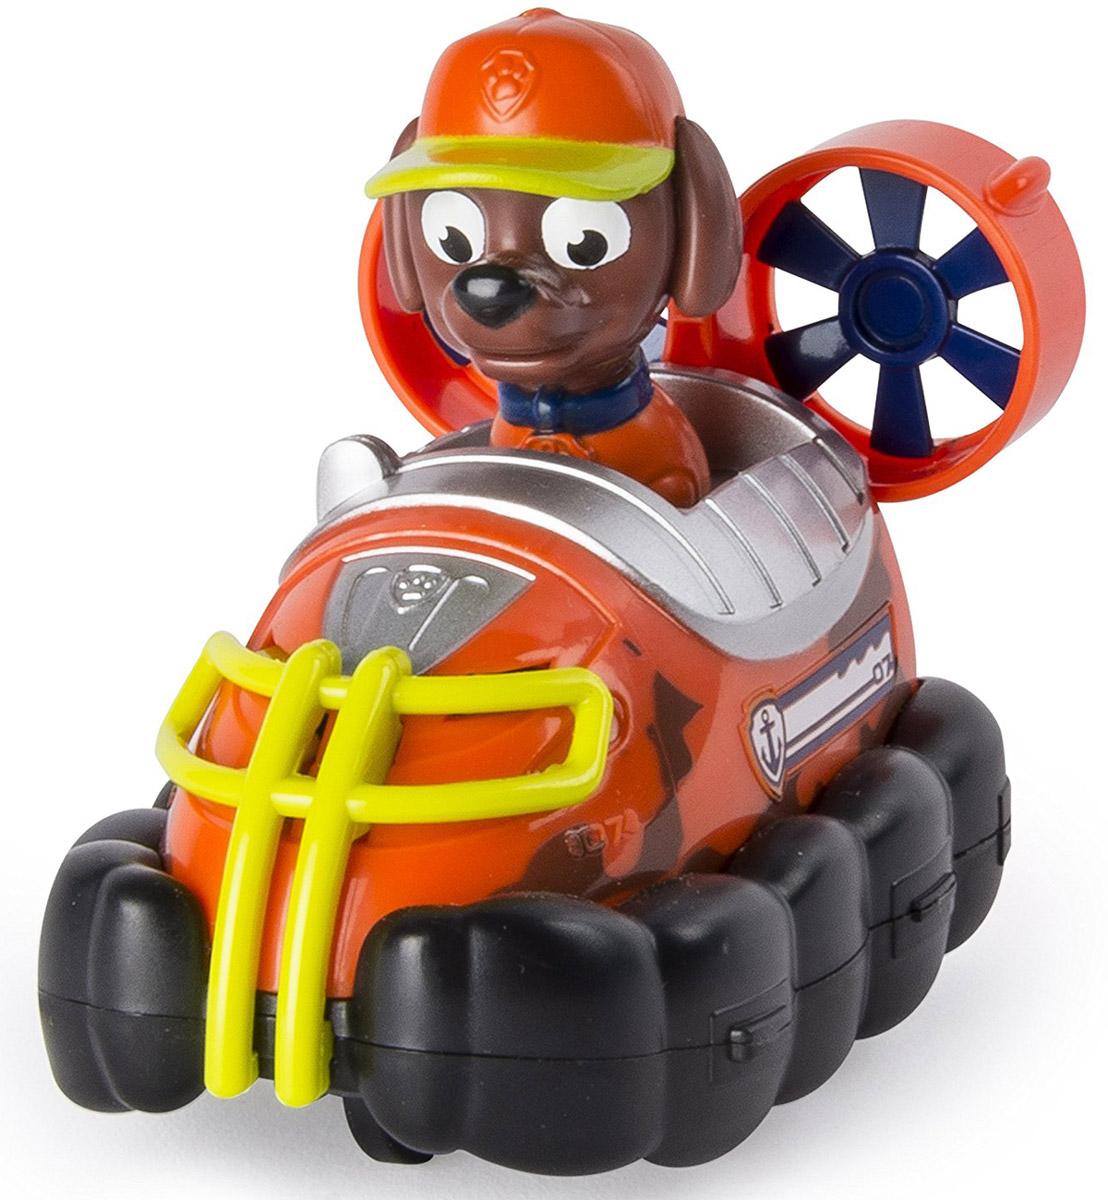 Paw Patrol Машинка спасателя Zuma игрушка spin master paw patrol мини машинка спасателя с фигуркой героя 16721